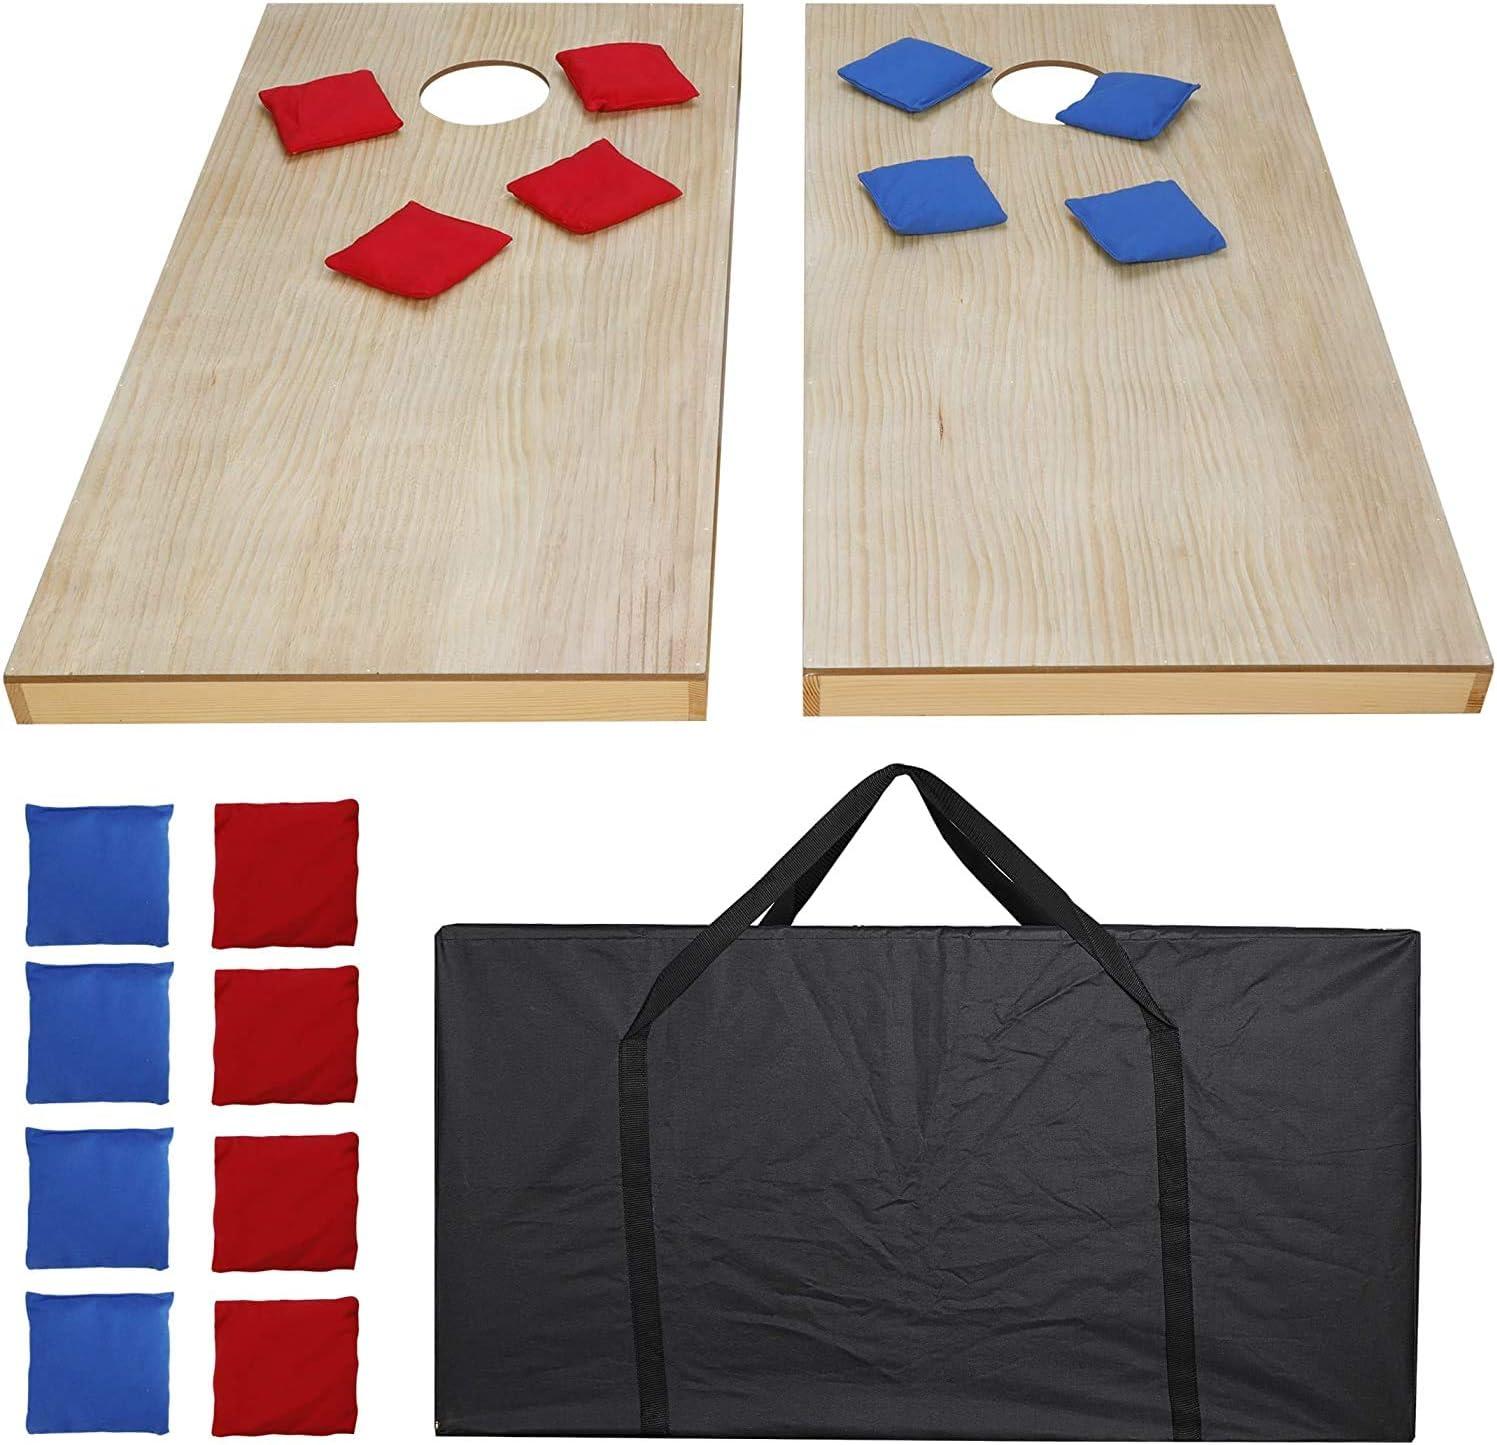 Bean Bag Toss Corn Toss Miami Themed 2x4 Custom Cornhole Board Set with bags Custom Corn Hole Bag Toss